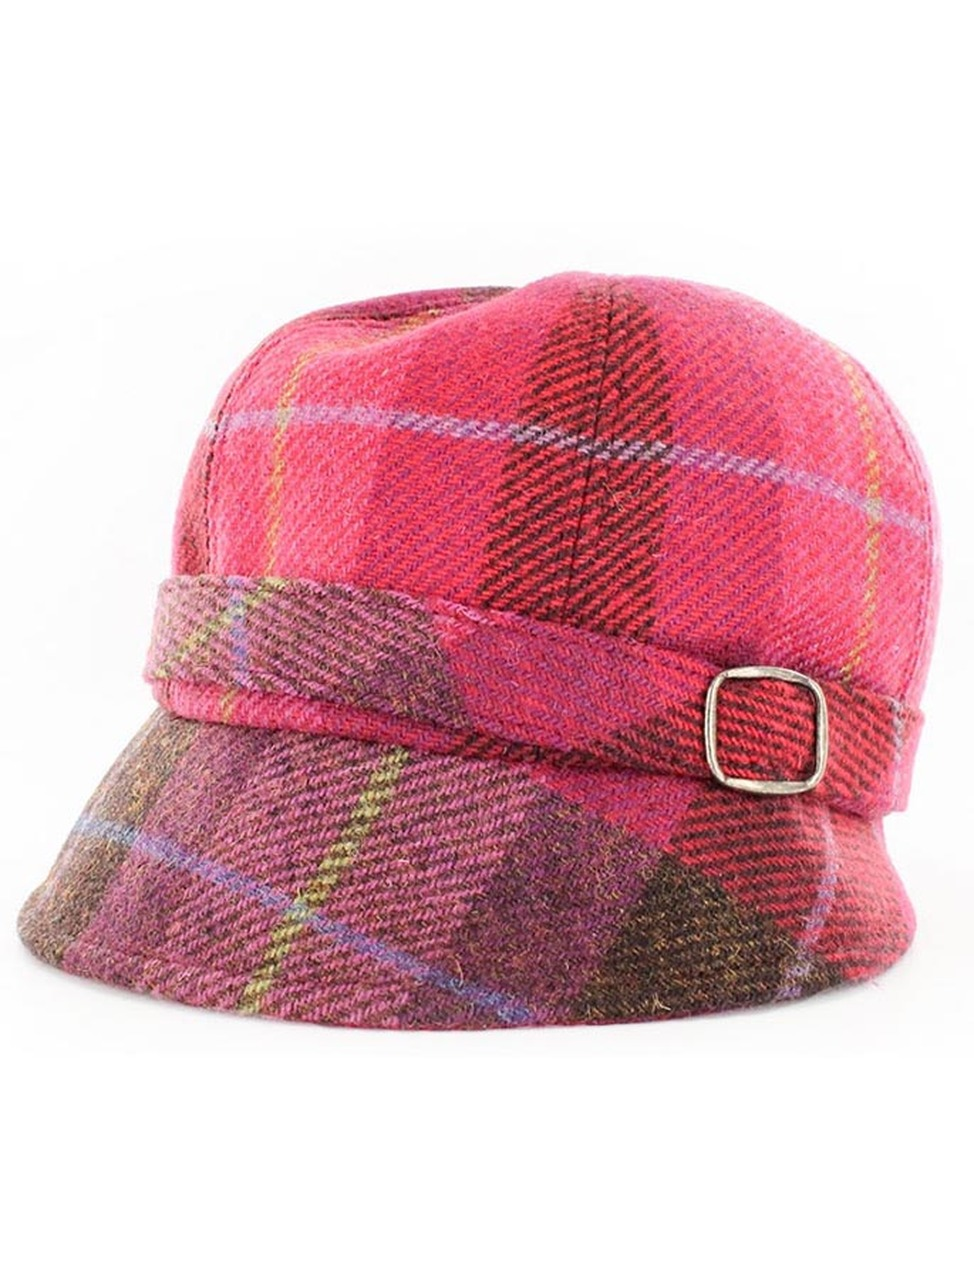 f73a483f764be Ladies Tweed Flapper Cap - Pink Plaid